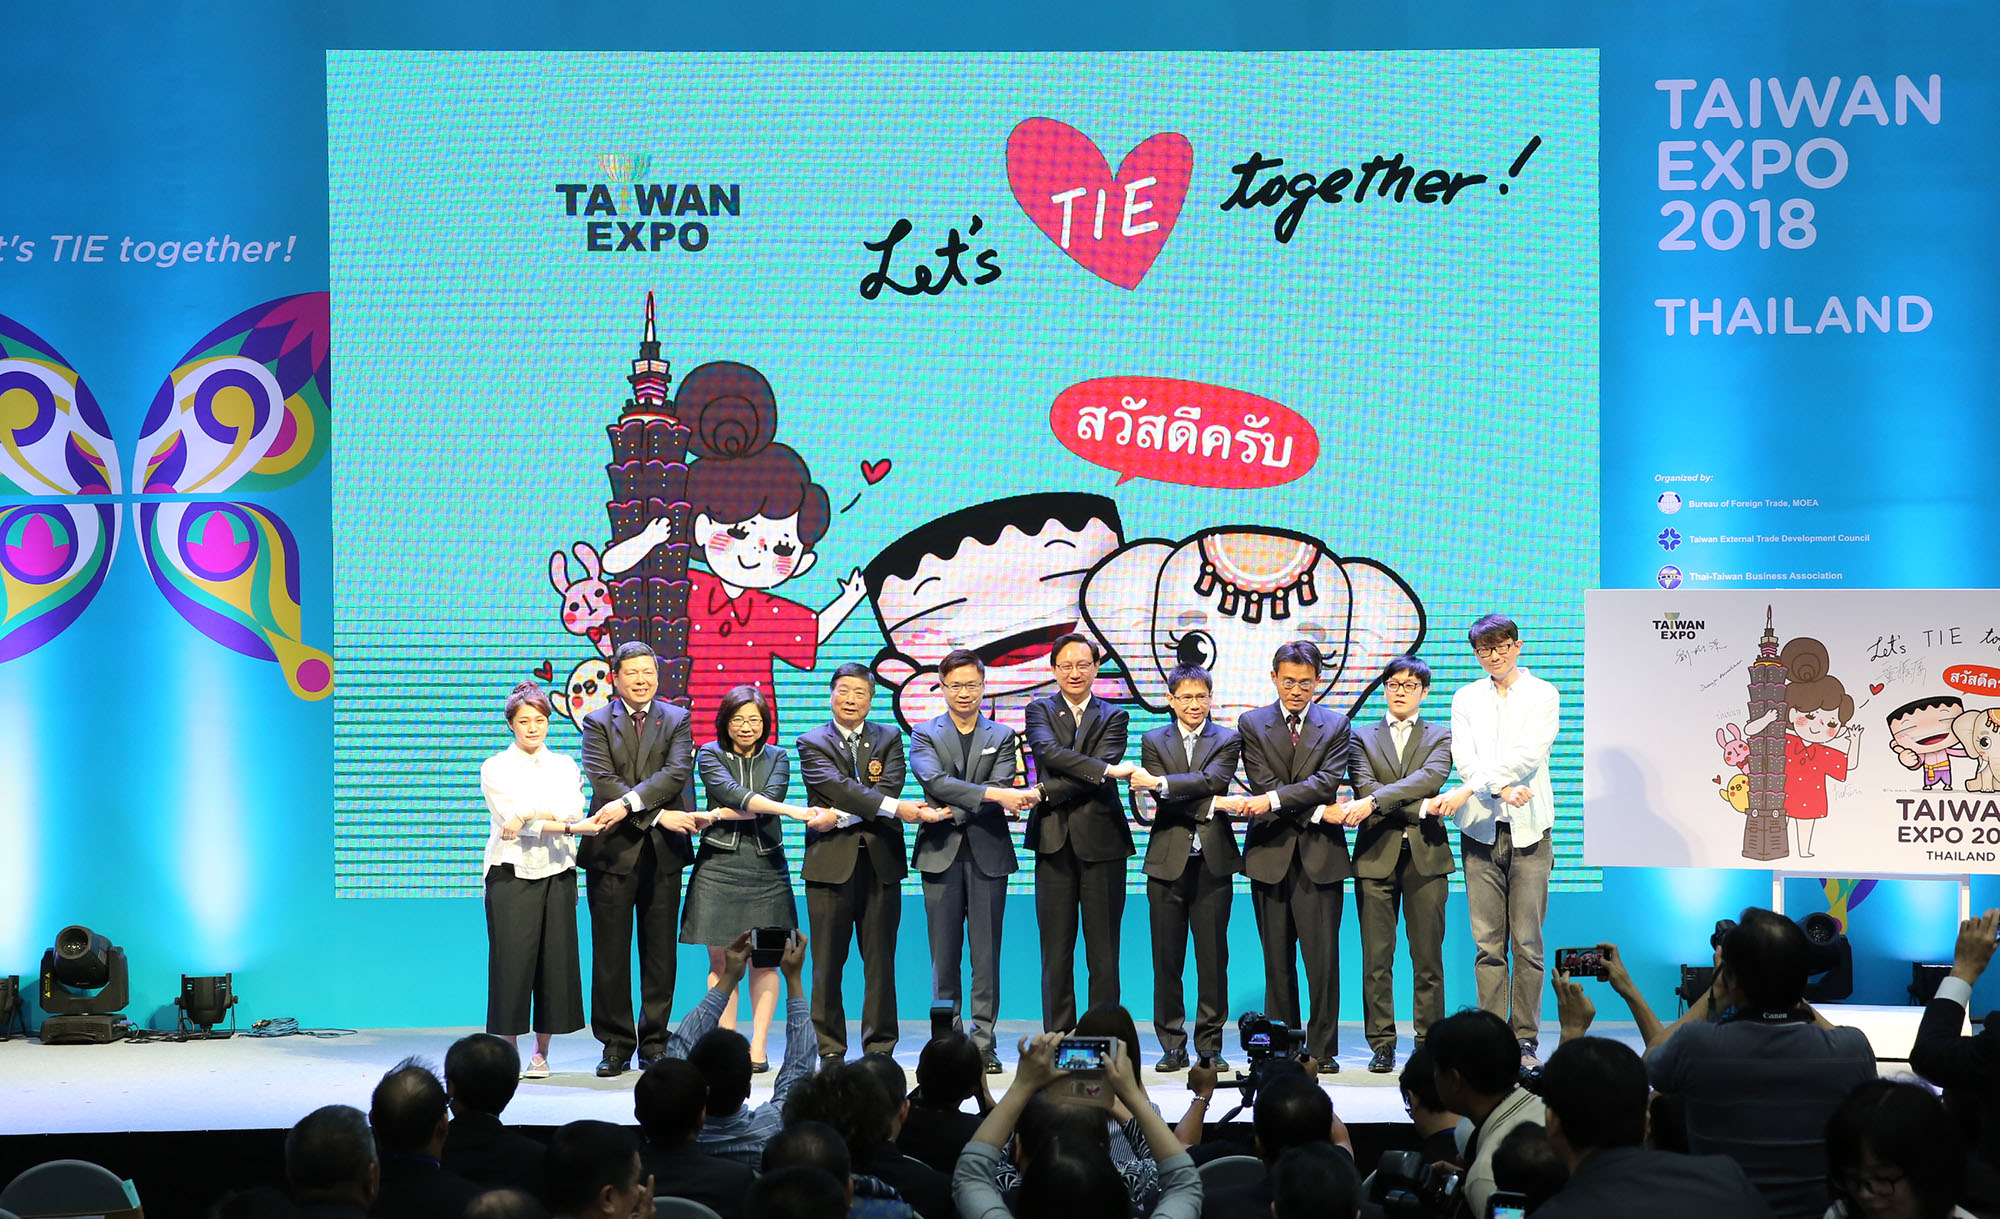 Taiwan Expo 2018 in Bangkok Thailand